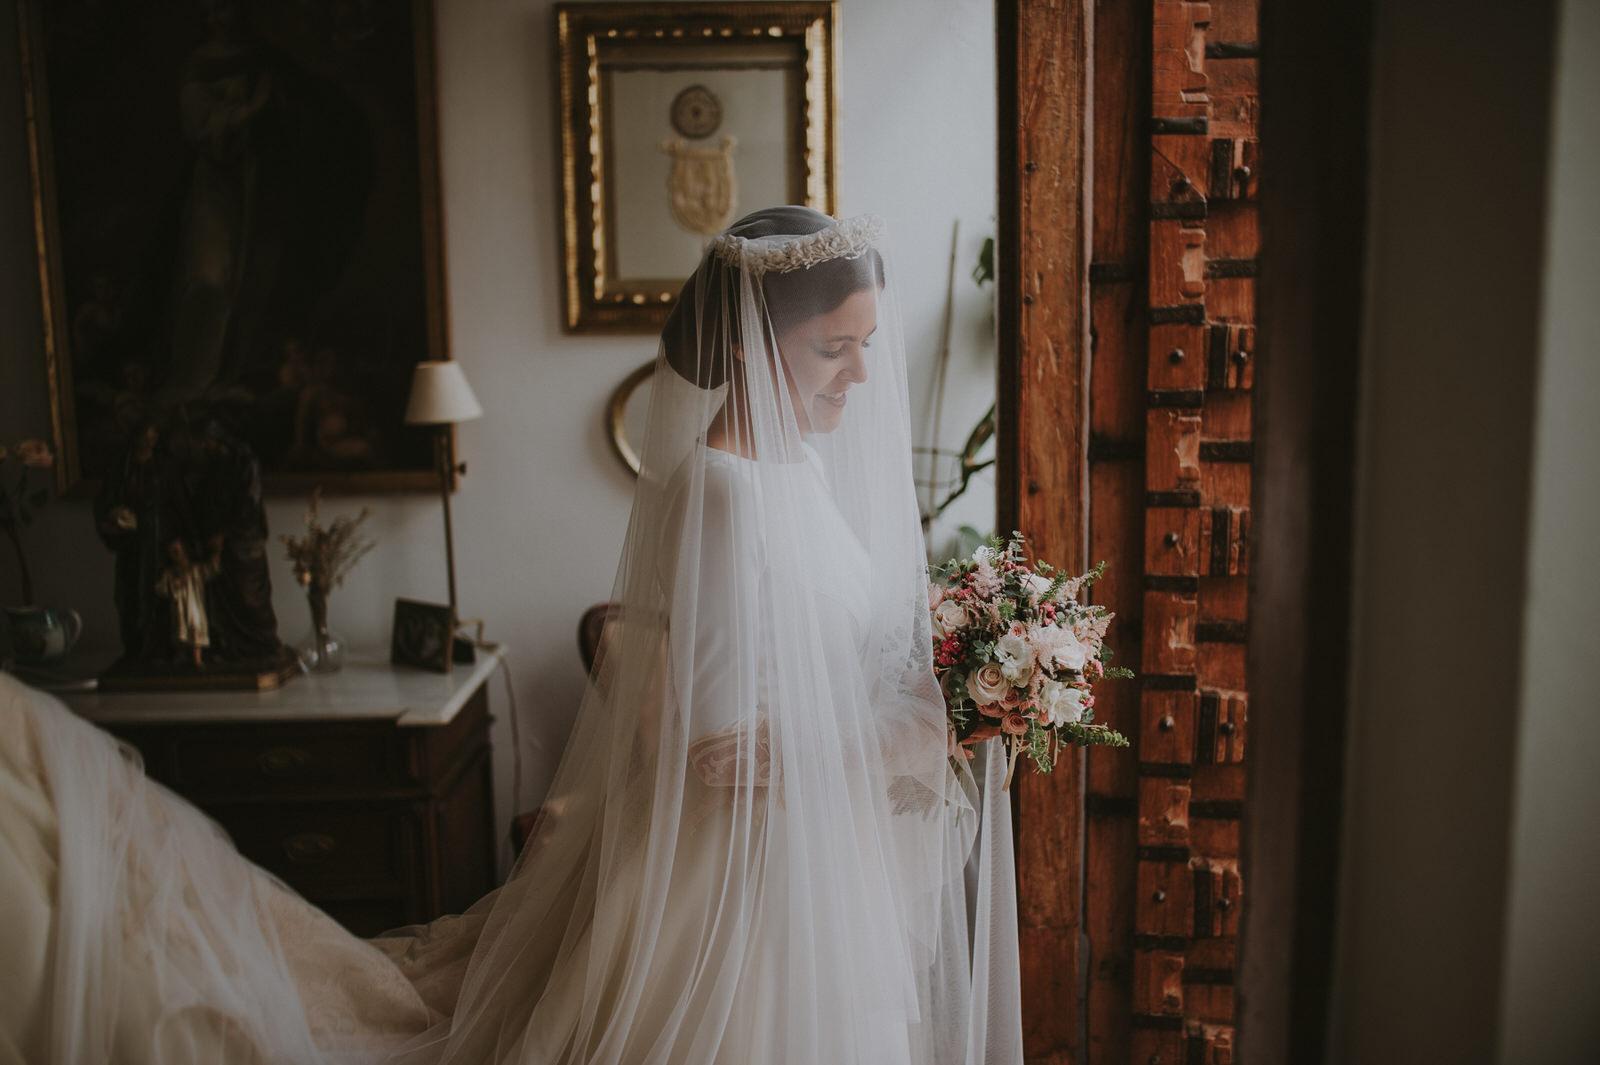 Judith & Gabriel - Boda en Olivares - Albaida, Fotógrafo de boda Andrés Amarillo - 20.JPG